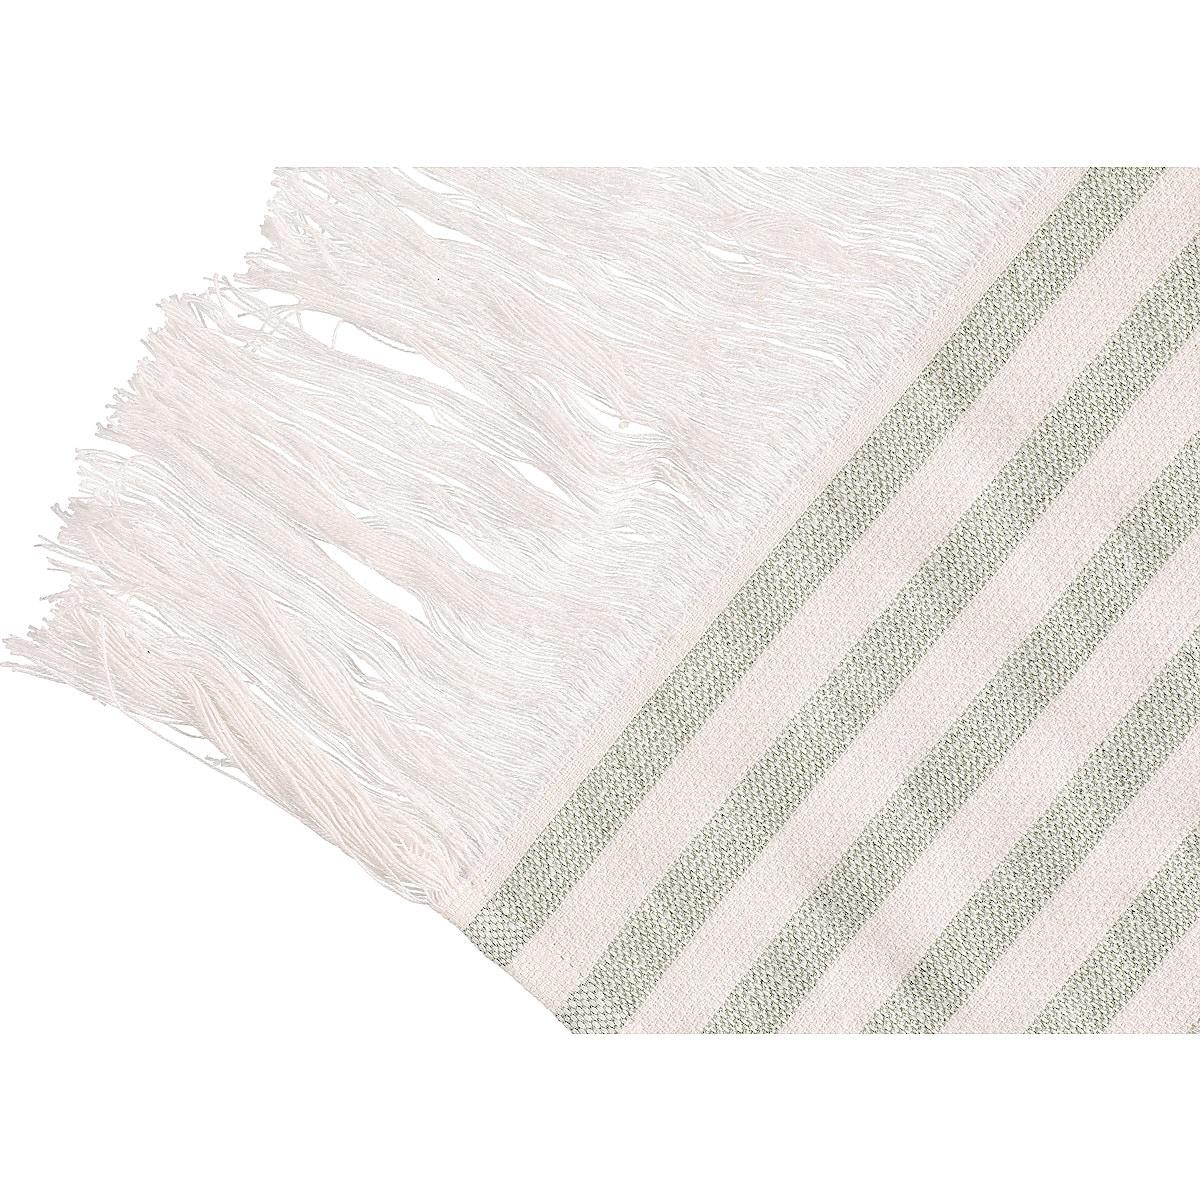 Rantapyyhe raidallinen 90 x 150 cm